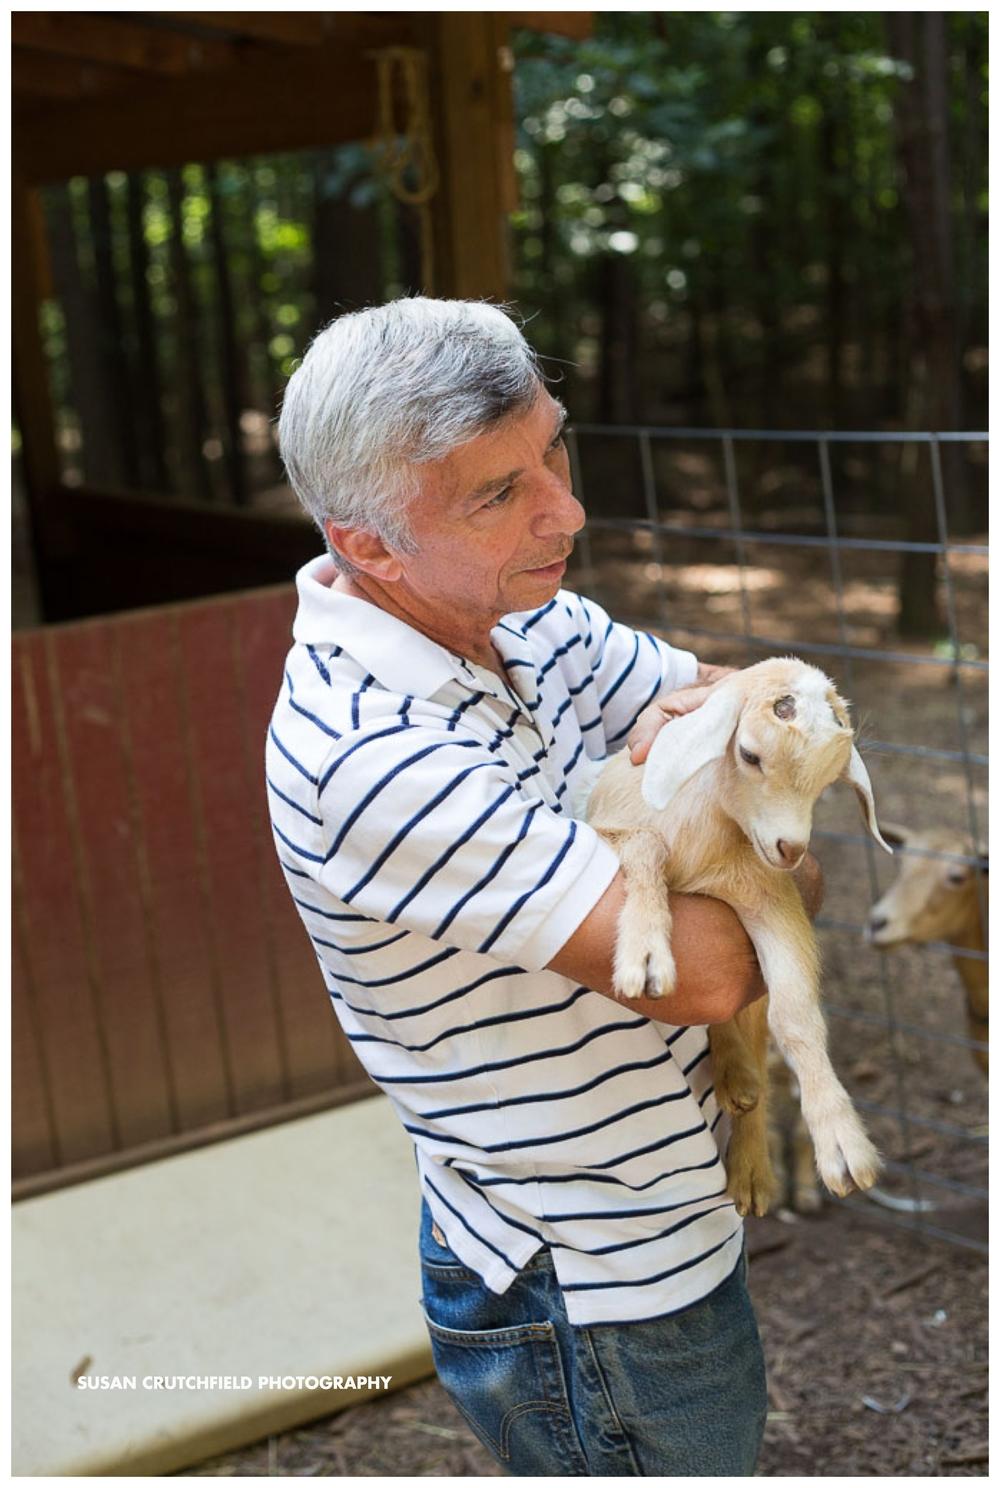 Baby goats farm life